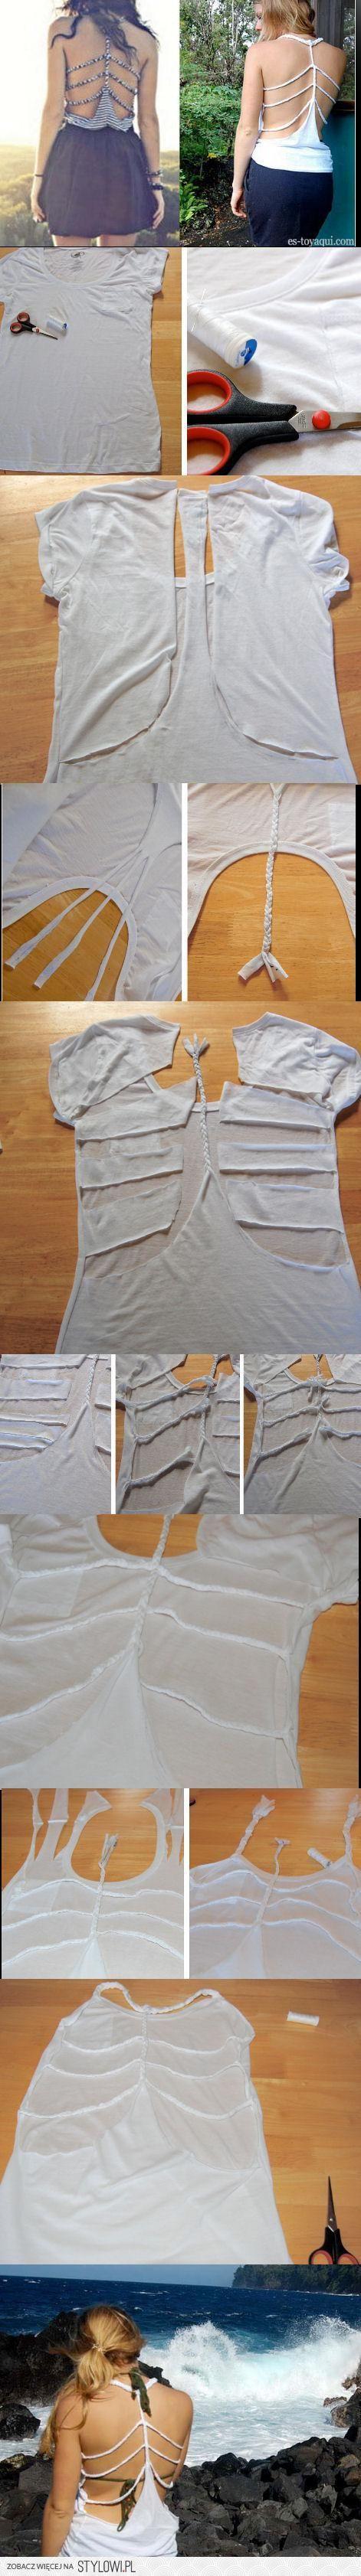 Shirt renovation